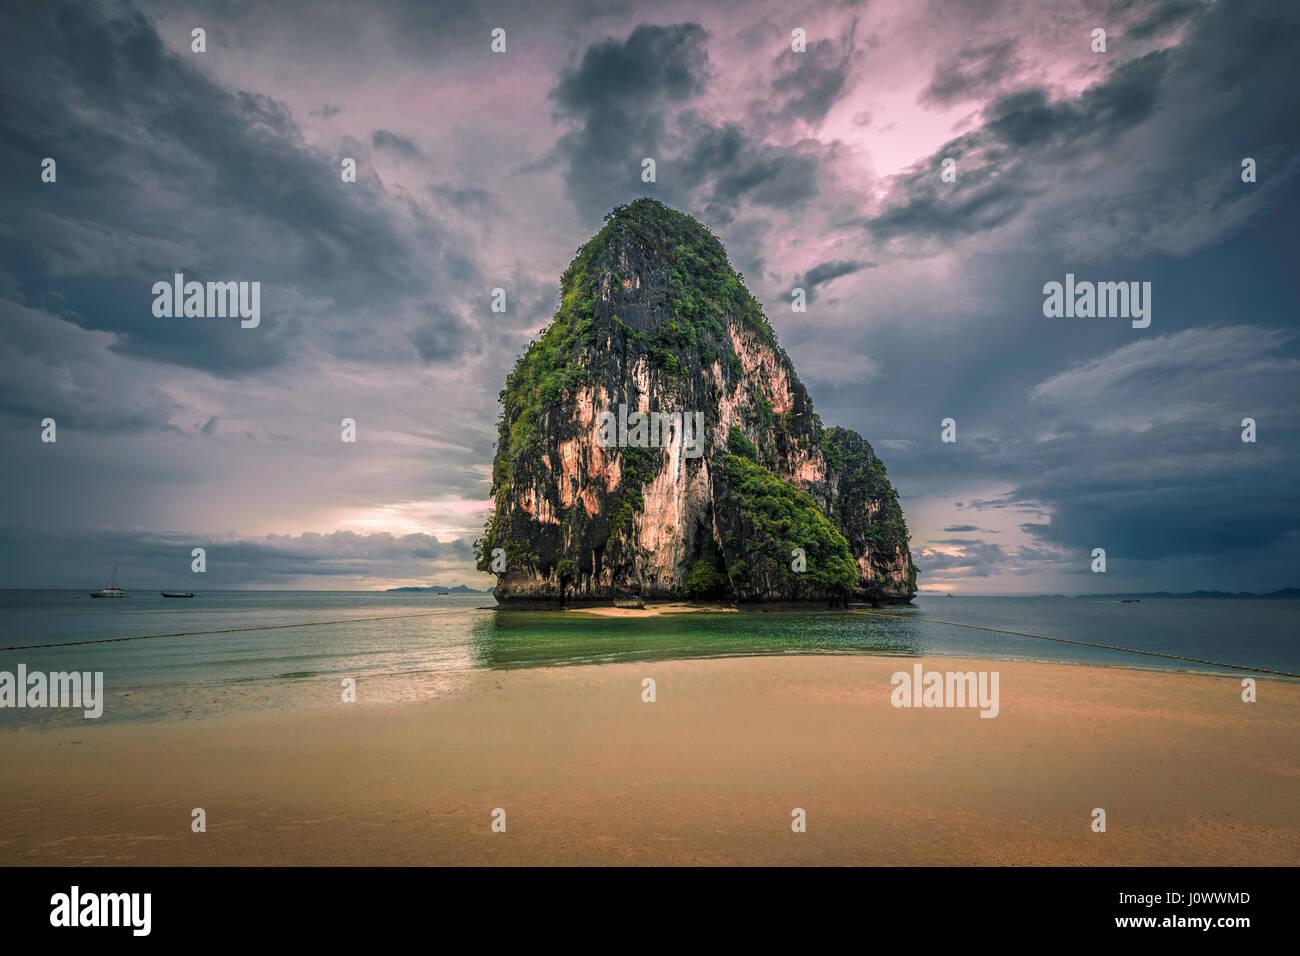 Happy Island off of Phra Nang beach, Railay, Krabi province, Thailand - Stock Image